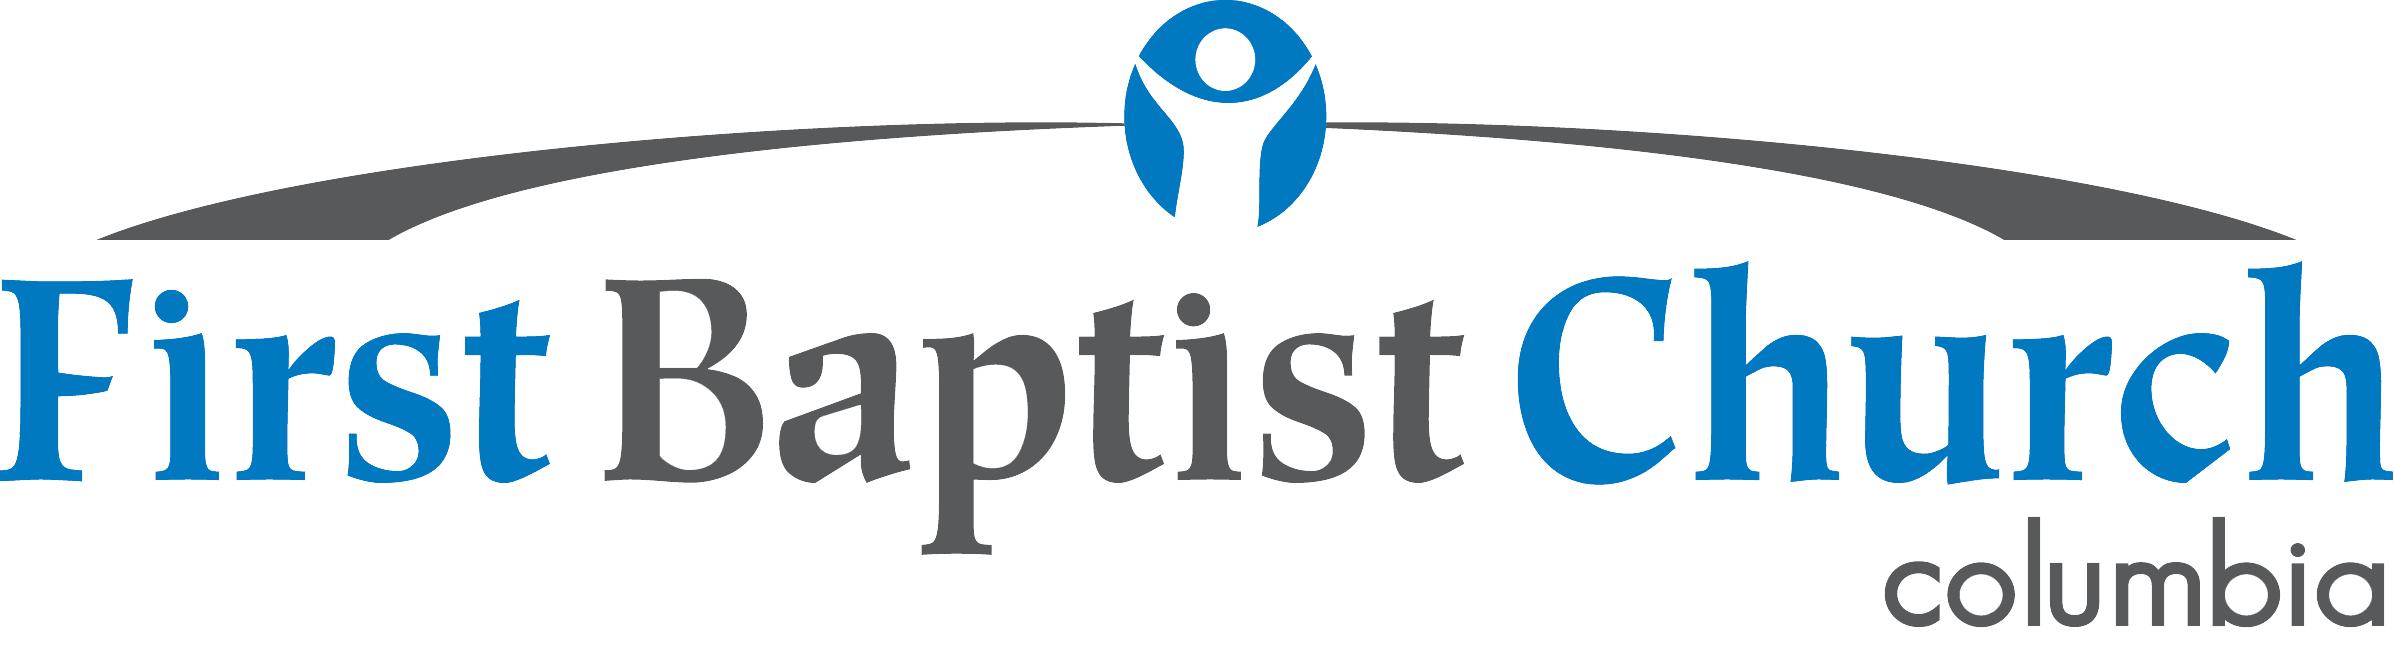 First columbia logo. Faith clipart baptist church